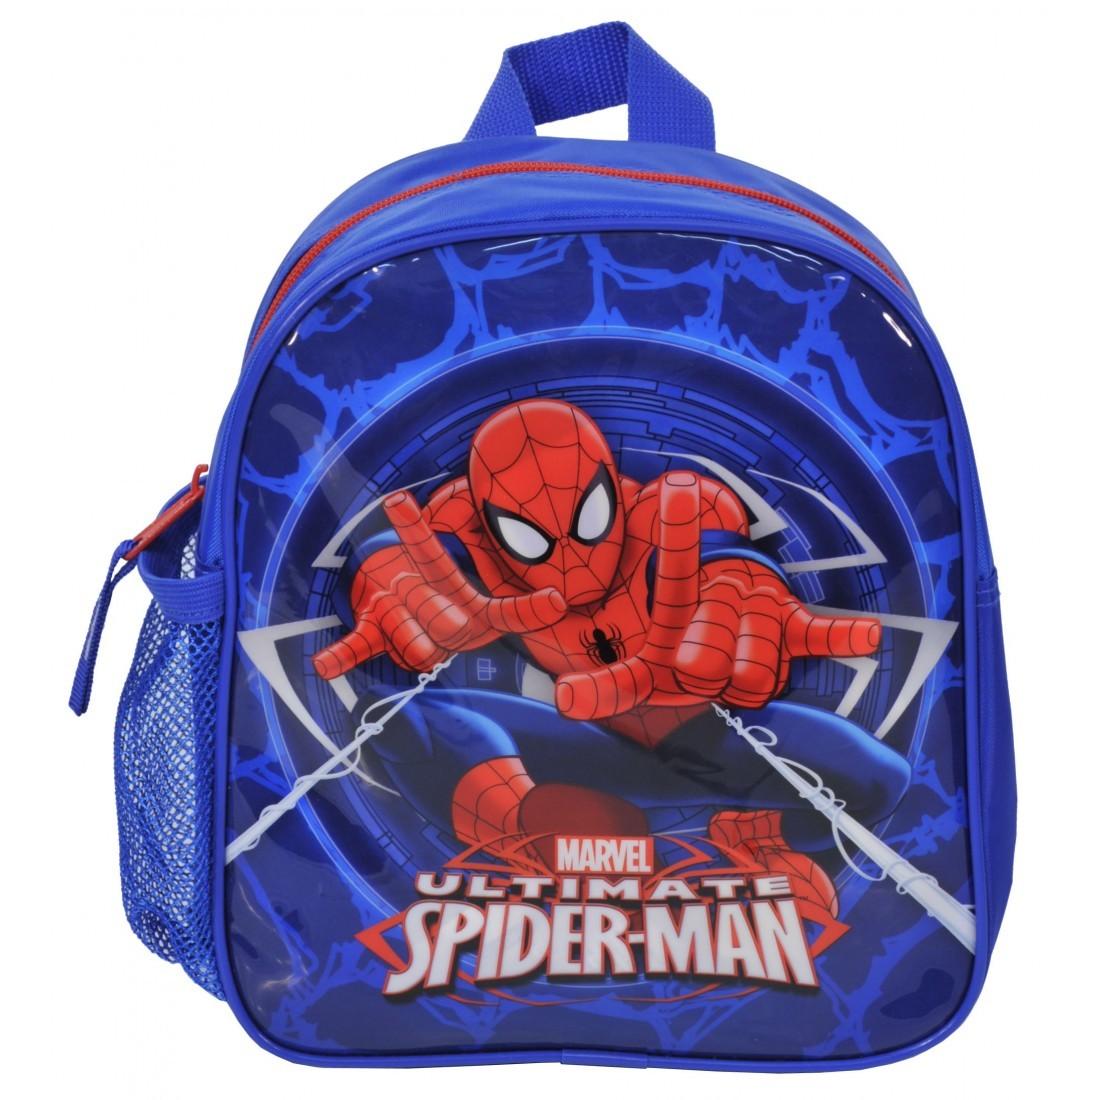 Plecaczek Spider Man Człowiek Pająk - plecak-tornister.pl